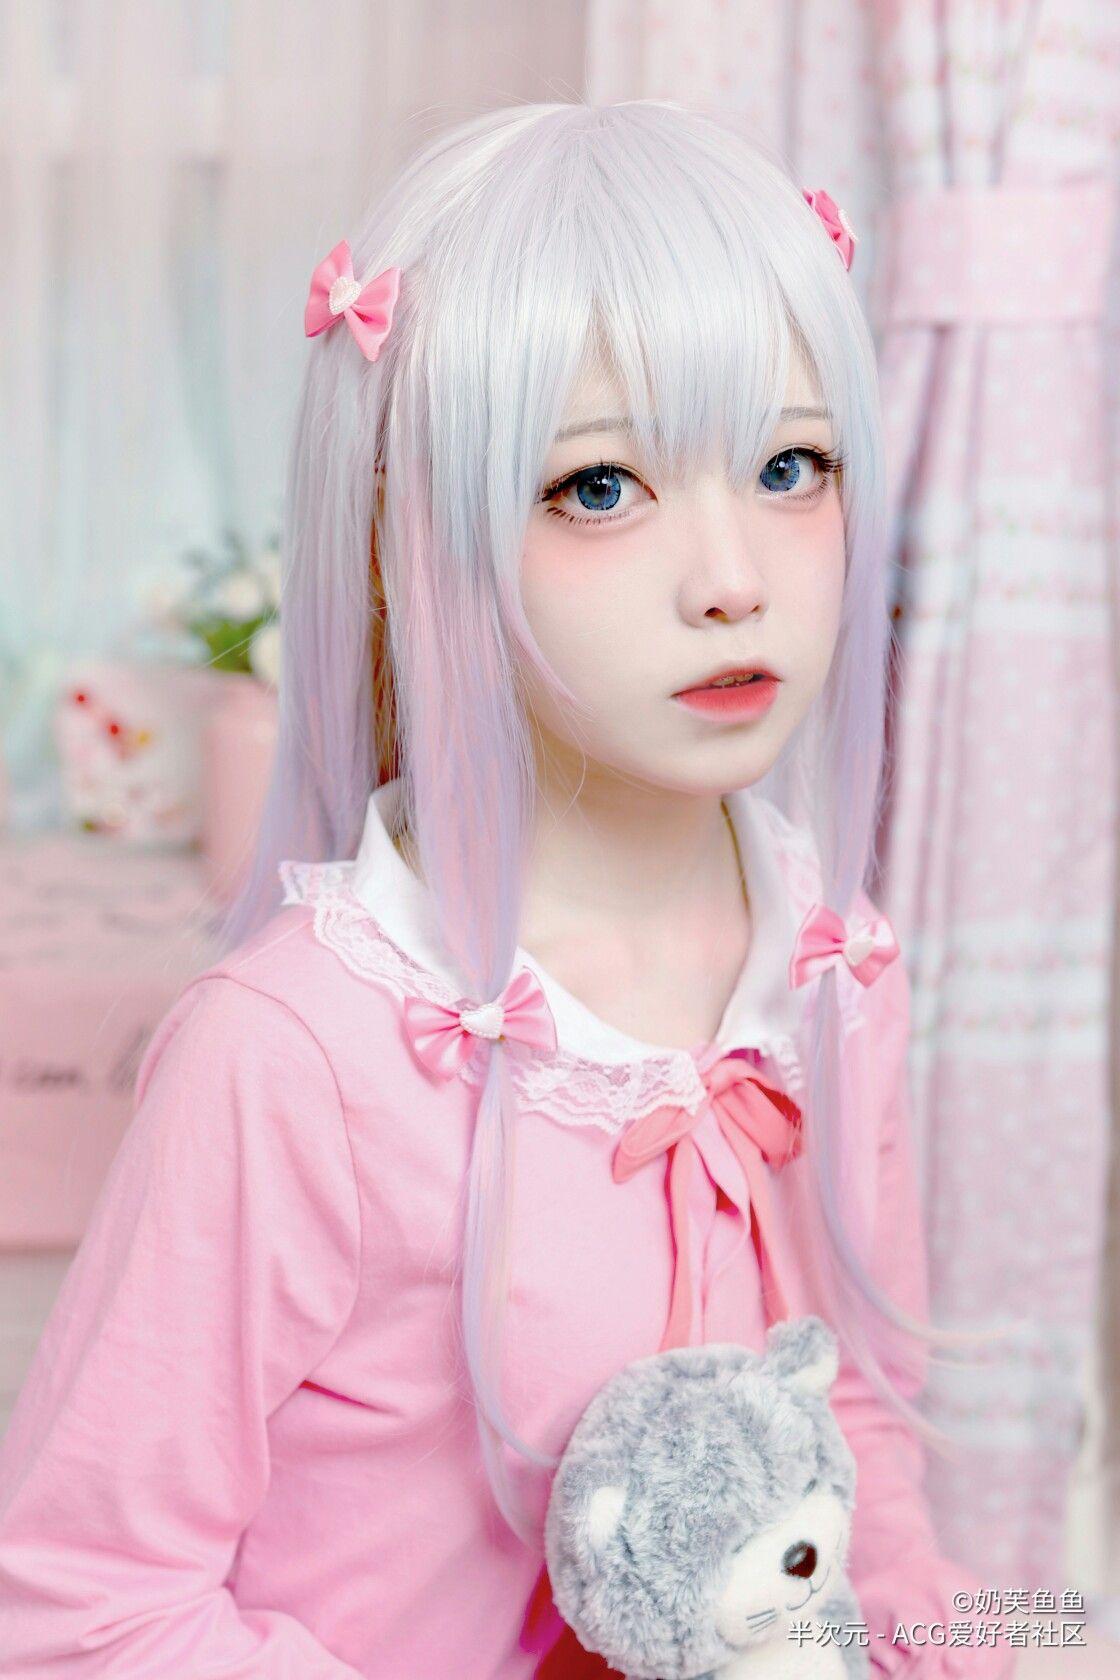 Pin oleh HimeQu di Kawaii cosplay Art-Qu